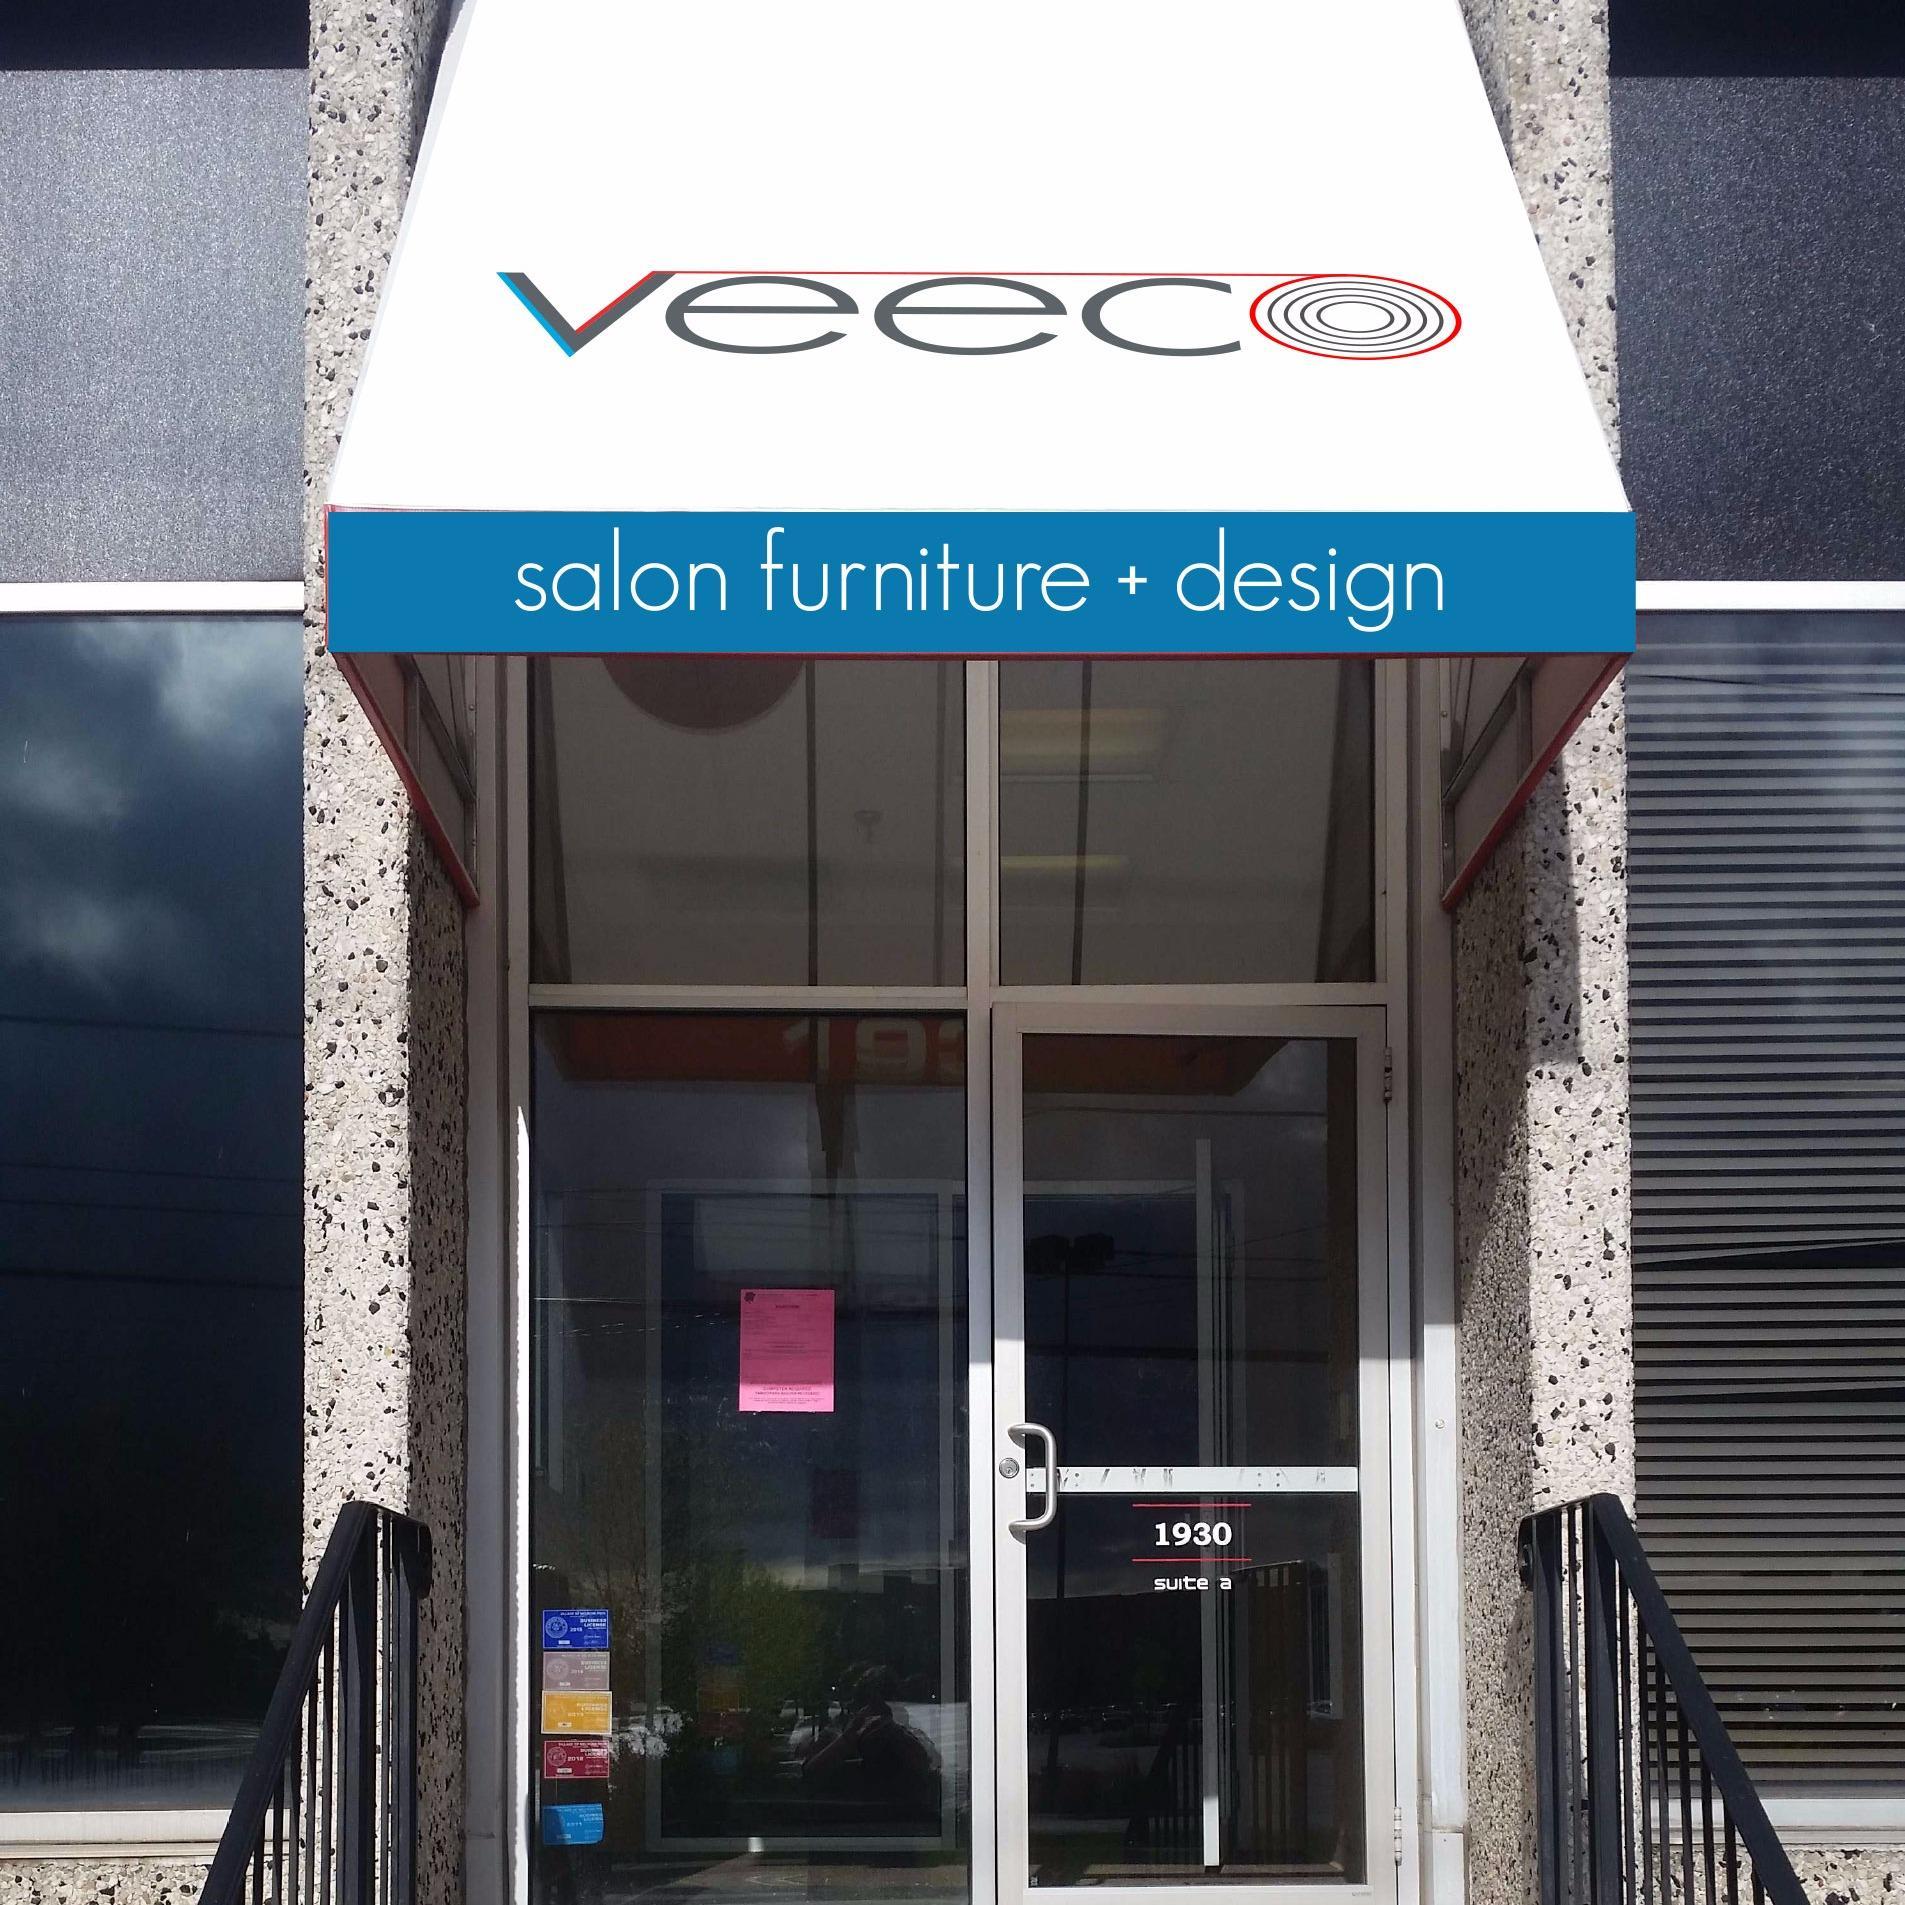 Veeco Salon Furniture + Design